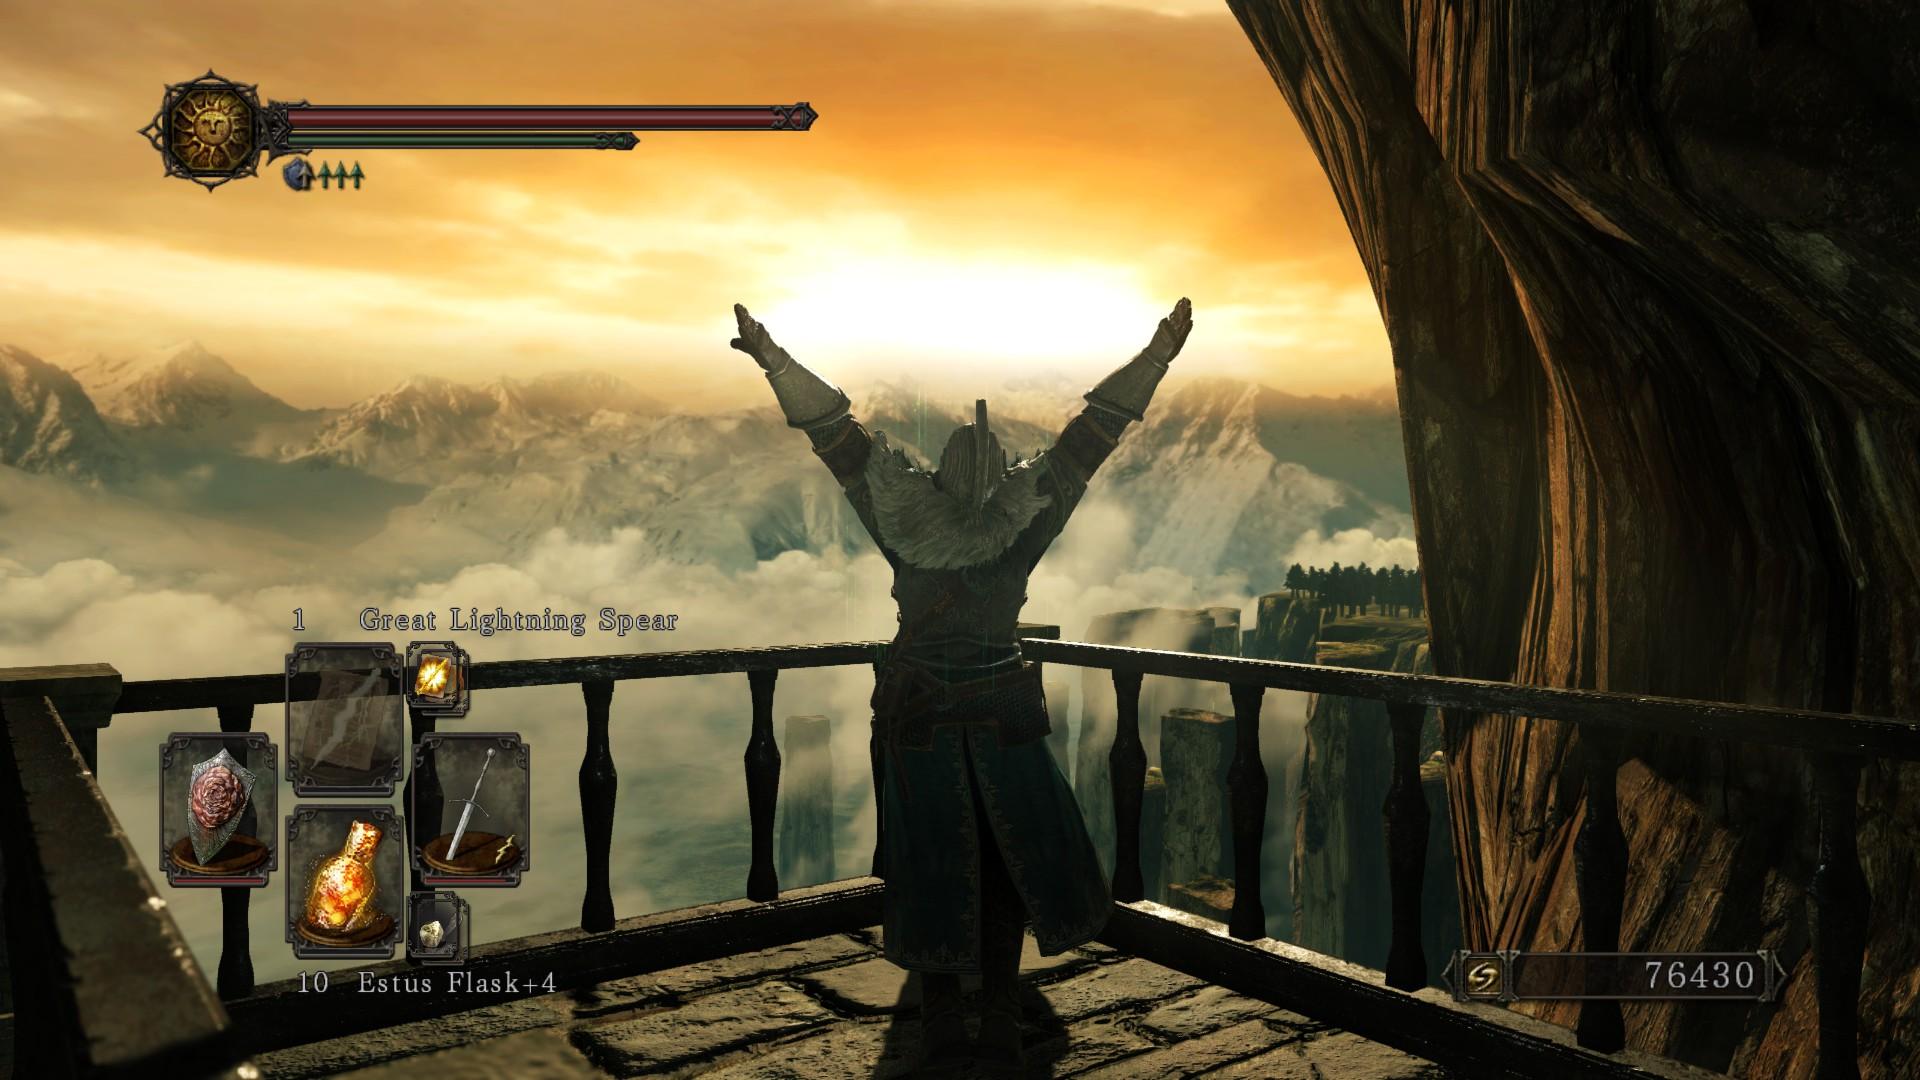 steam community screenshot praise the sun